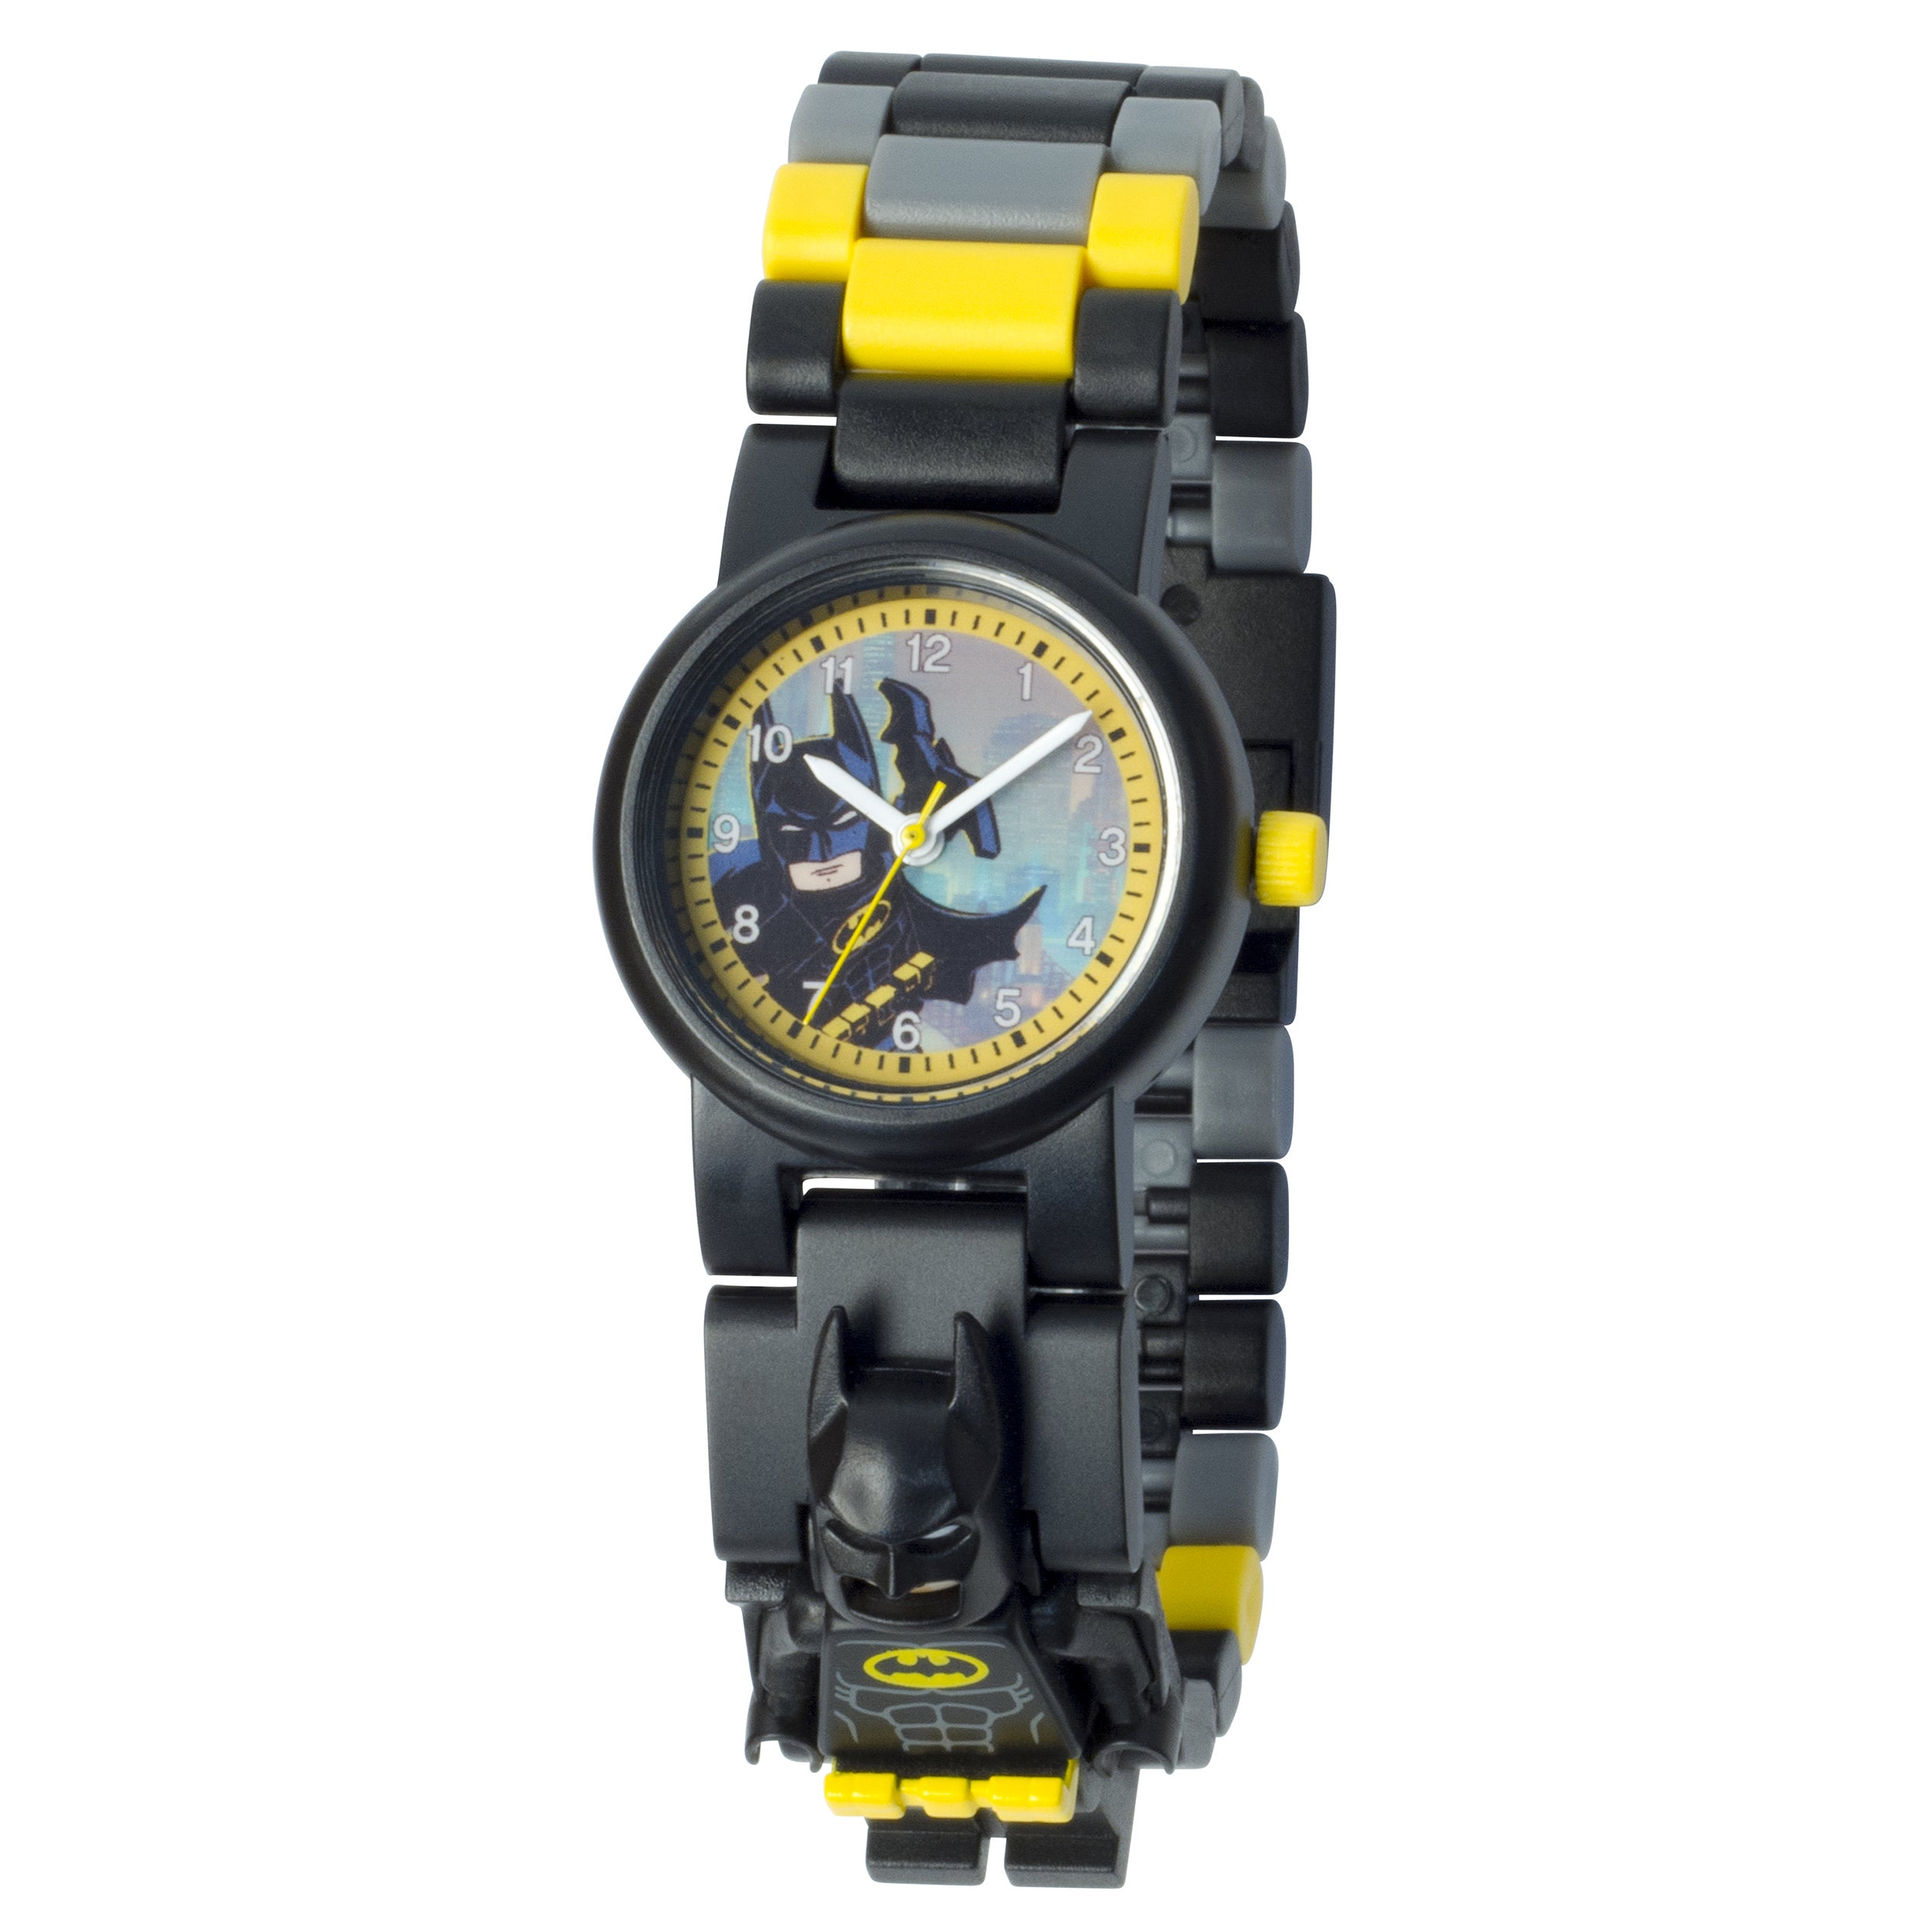 Lego Batman Movie 'Batman' Minifigure Link Watch (Black),...